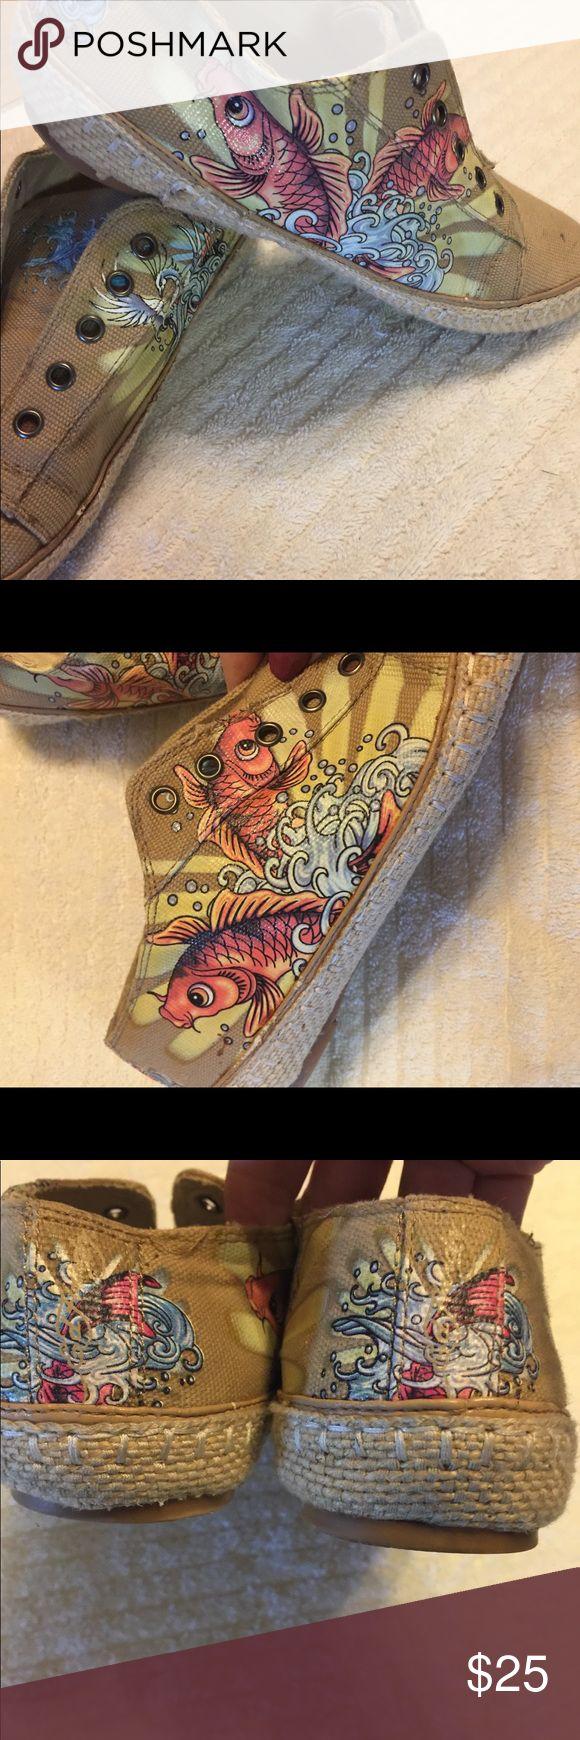 Koi fish Ed Hardy shoes Interesting and fun Ed Hardy shoes Ed Hardy Shoes Flats & Loafers